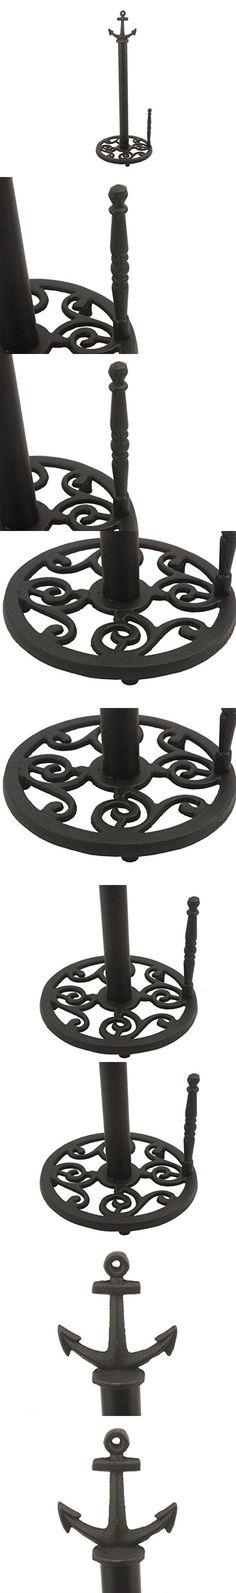 "Hampton Nautical K-1414B-Black 3Xglass-101 Rustic black Cast Iron Anchor Paper Towel Holder 16"" - Nautical Decor - Nautical Home Decoration"